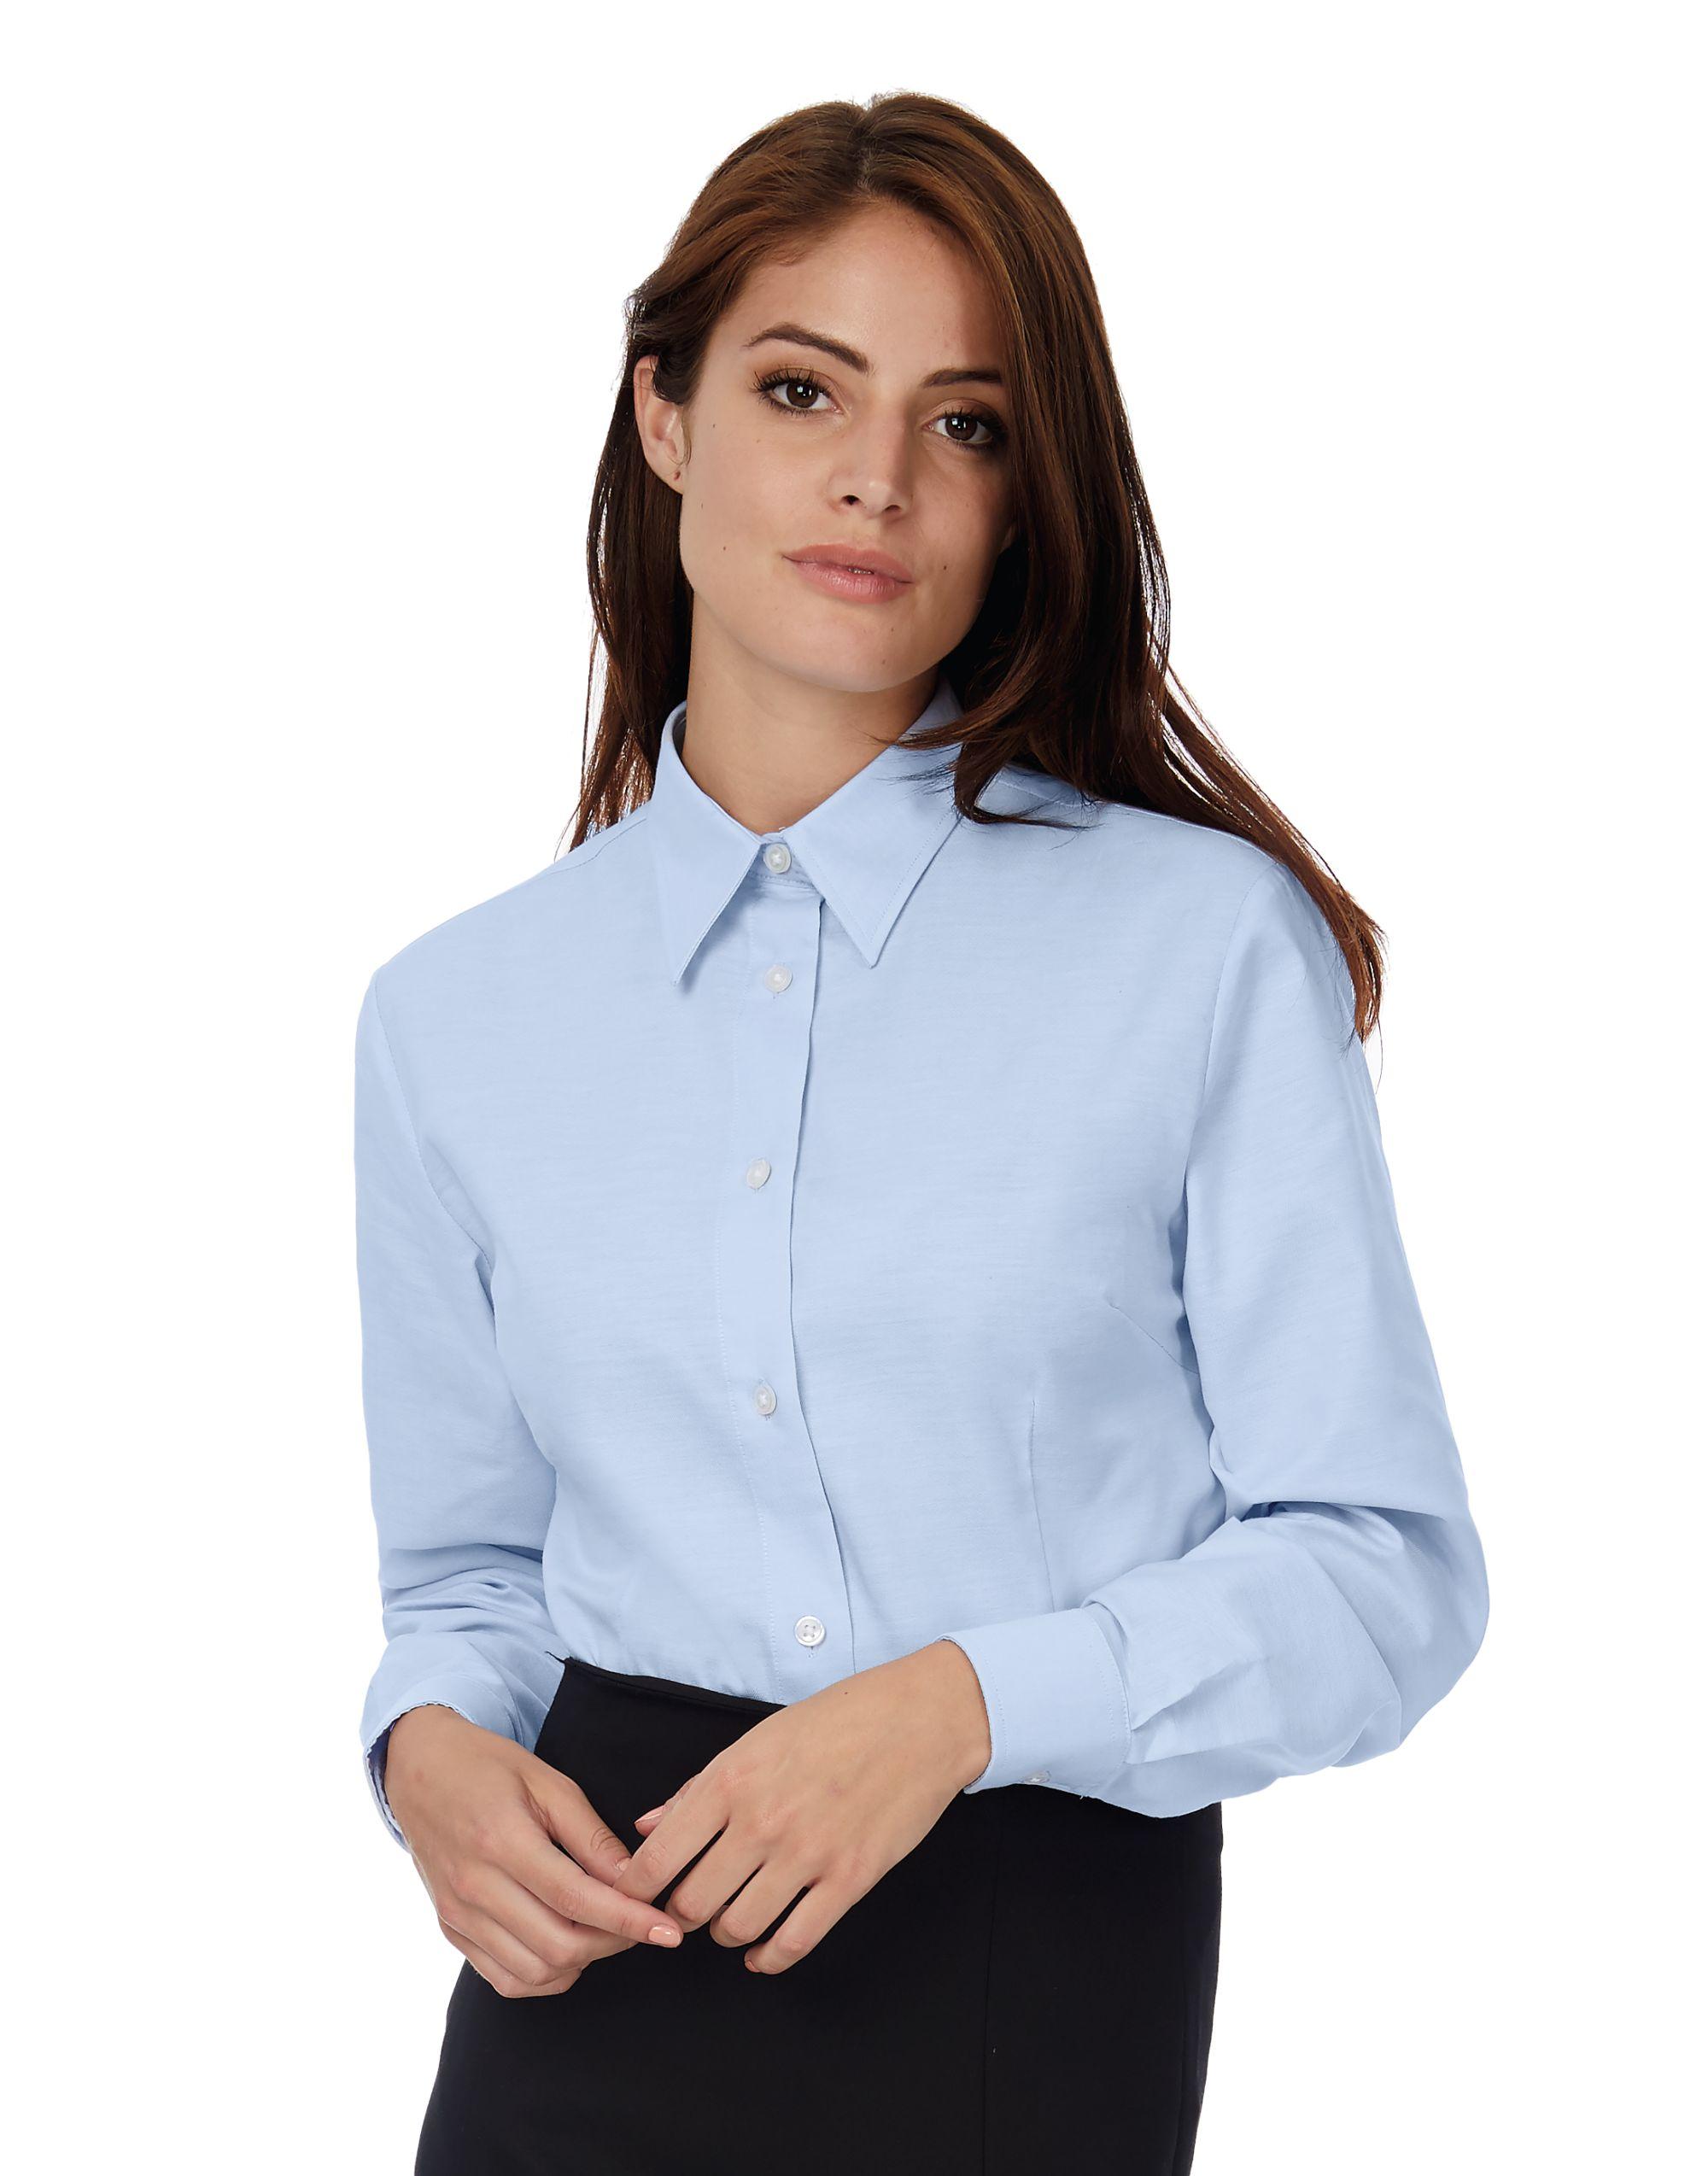 B&C Women's Oxford Long Sleeve Shirt